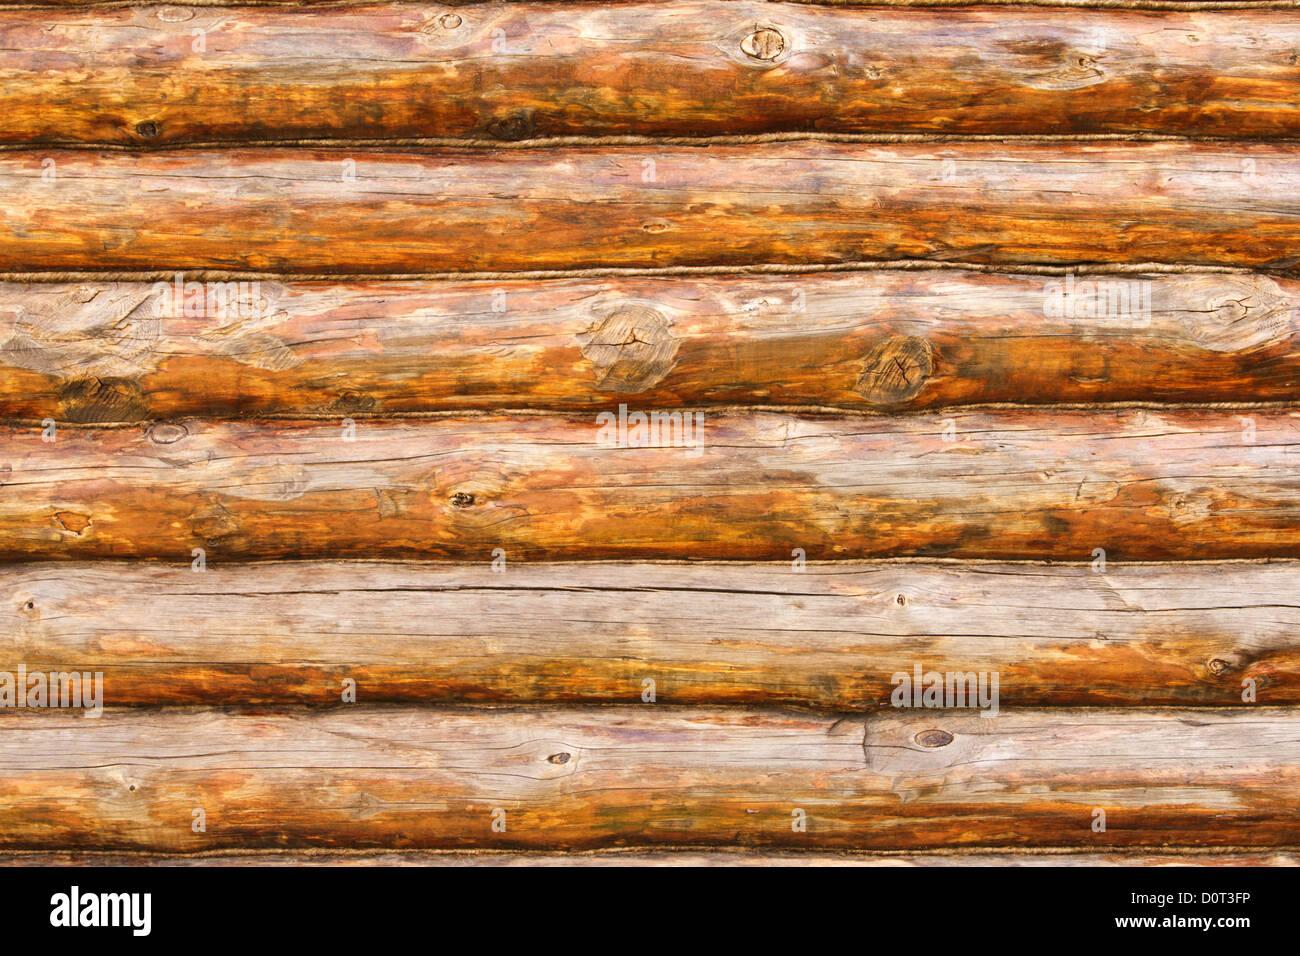 Rustic Pine Log Cabin Wall Stock Photo Alamy